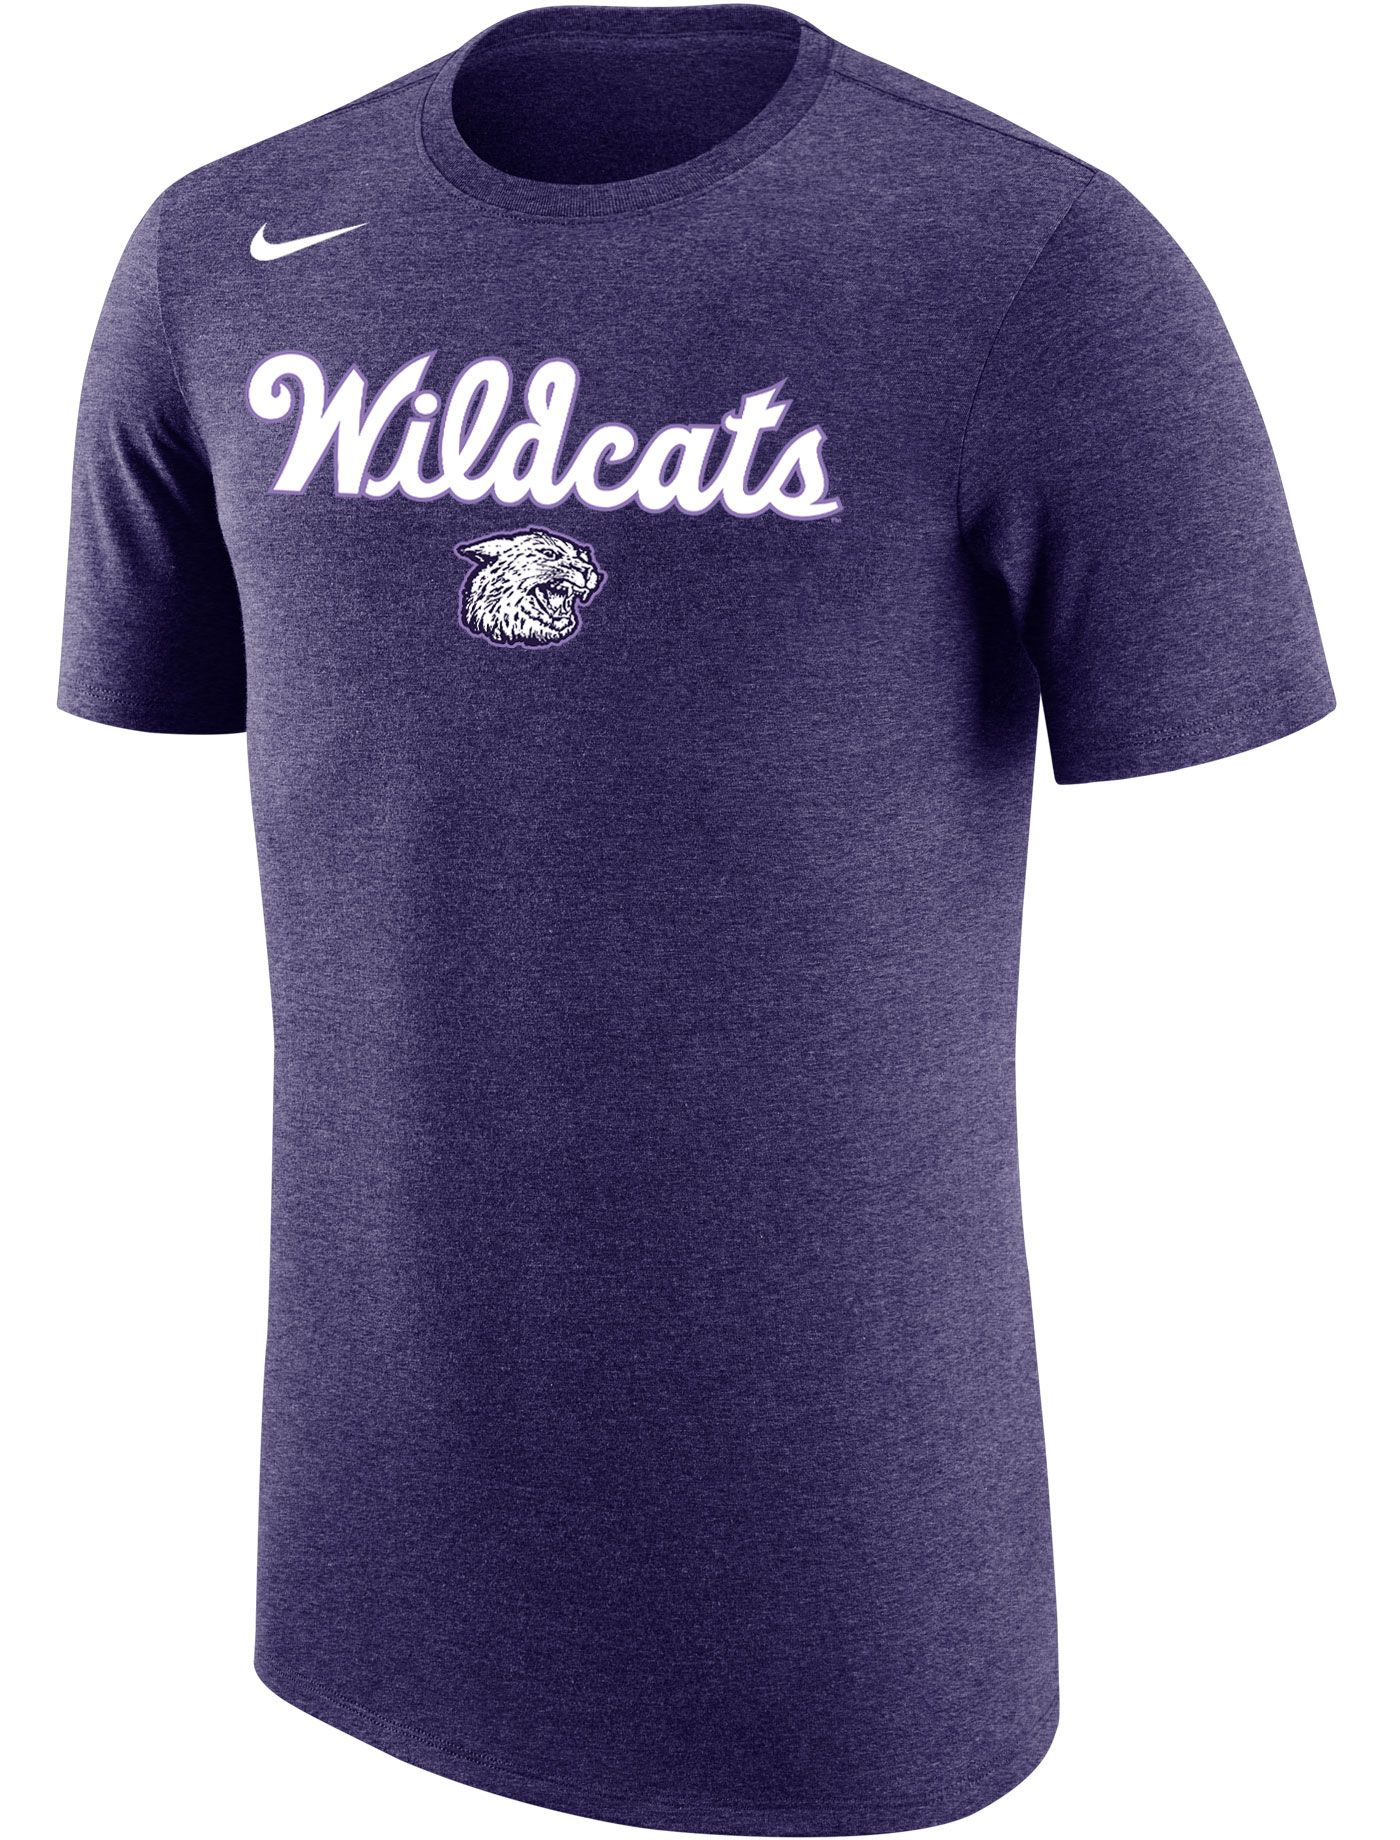 Nike Men's Kansas State Wildcats Purple Dri-FIT Retro Basketball T-Shirt